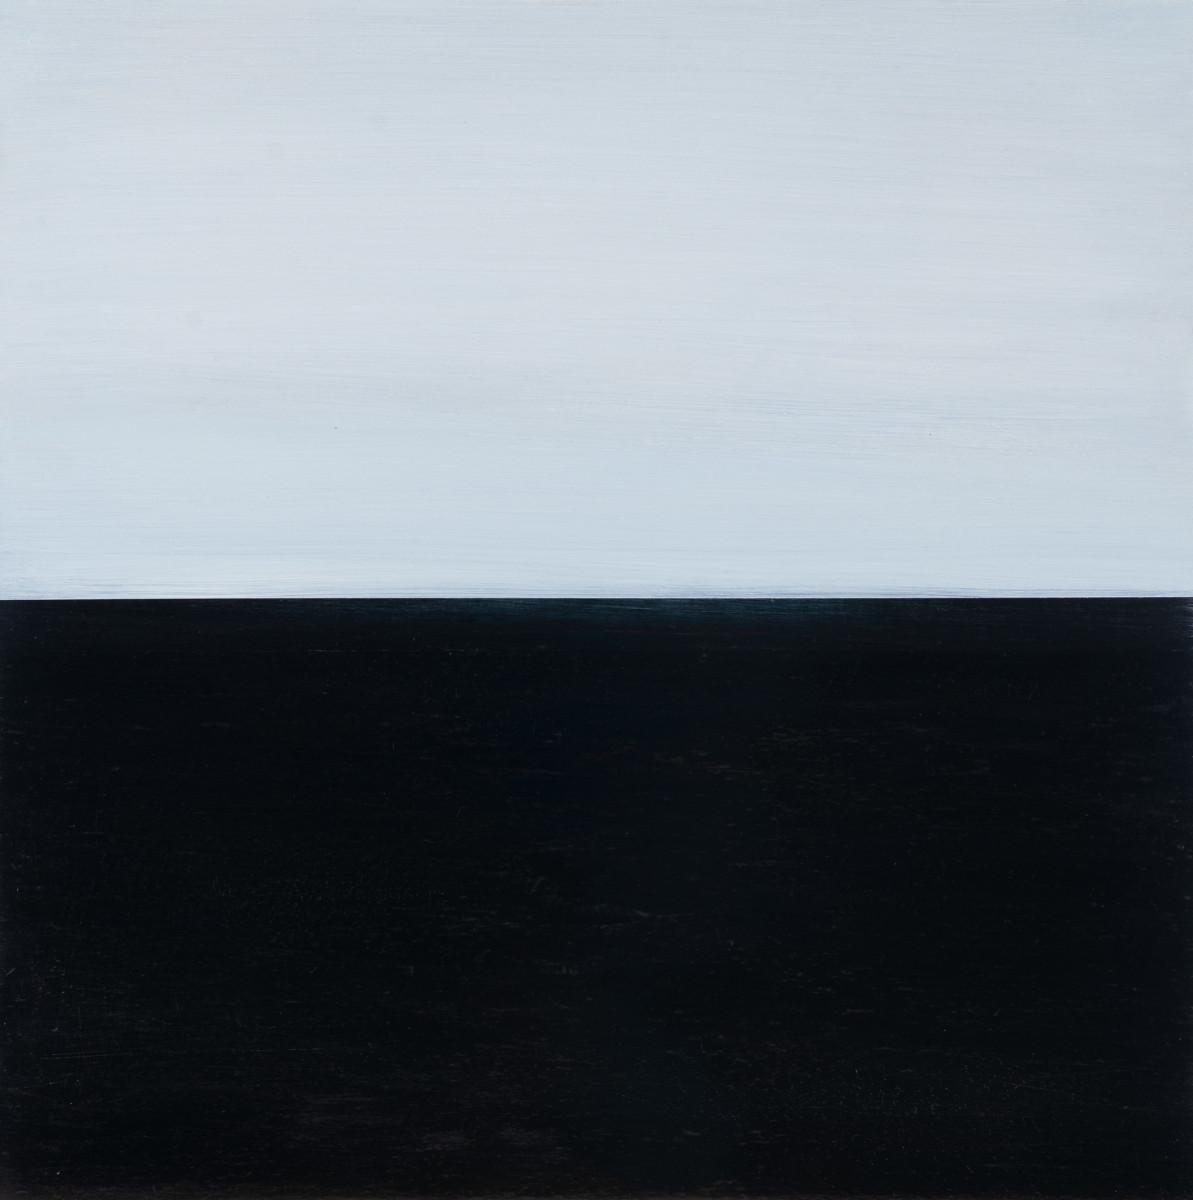 Waves&Horizons Graphite 13 by Claudia De Grandi